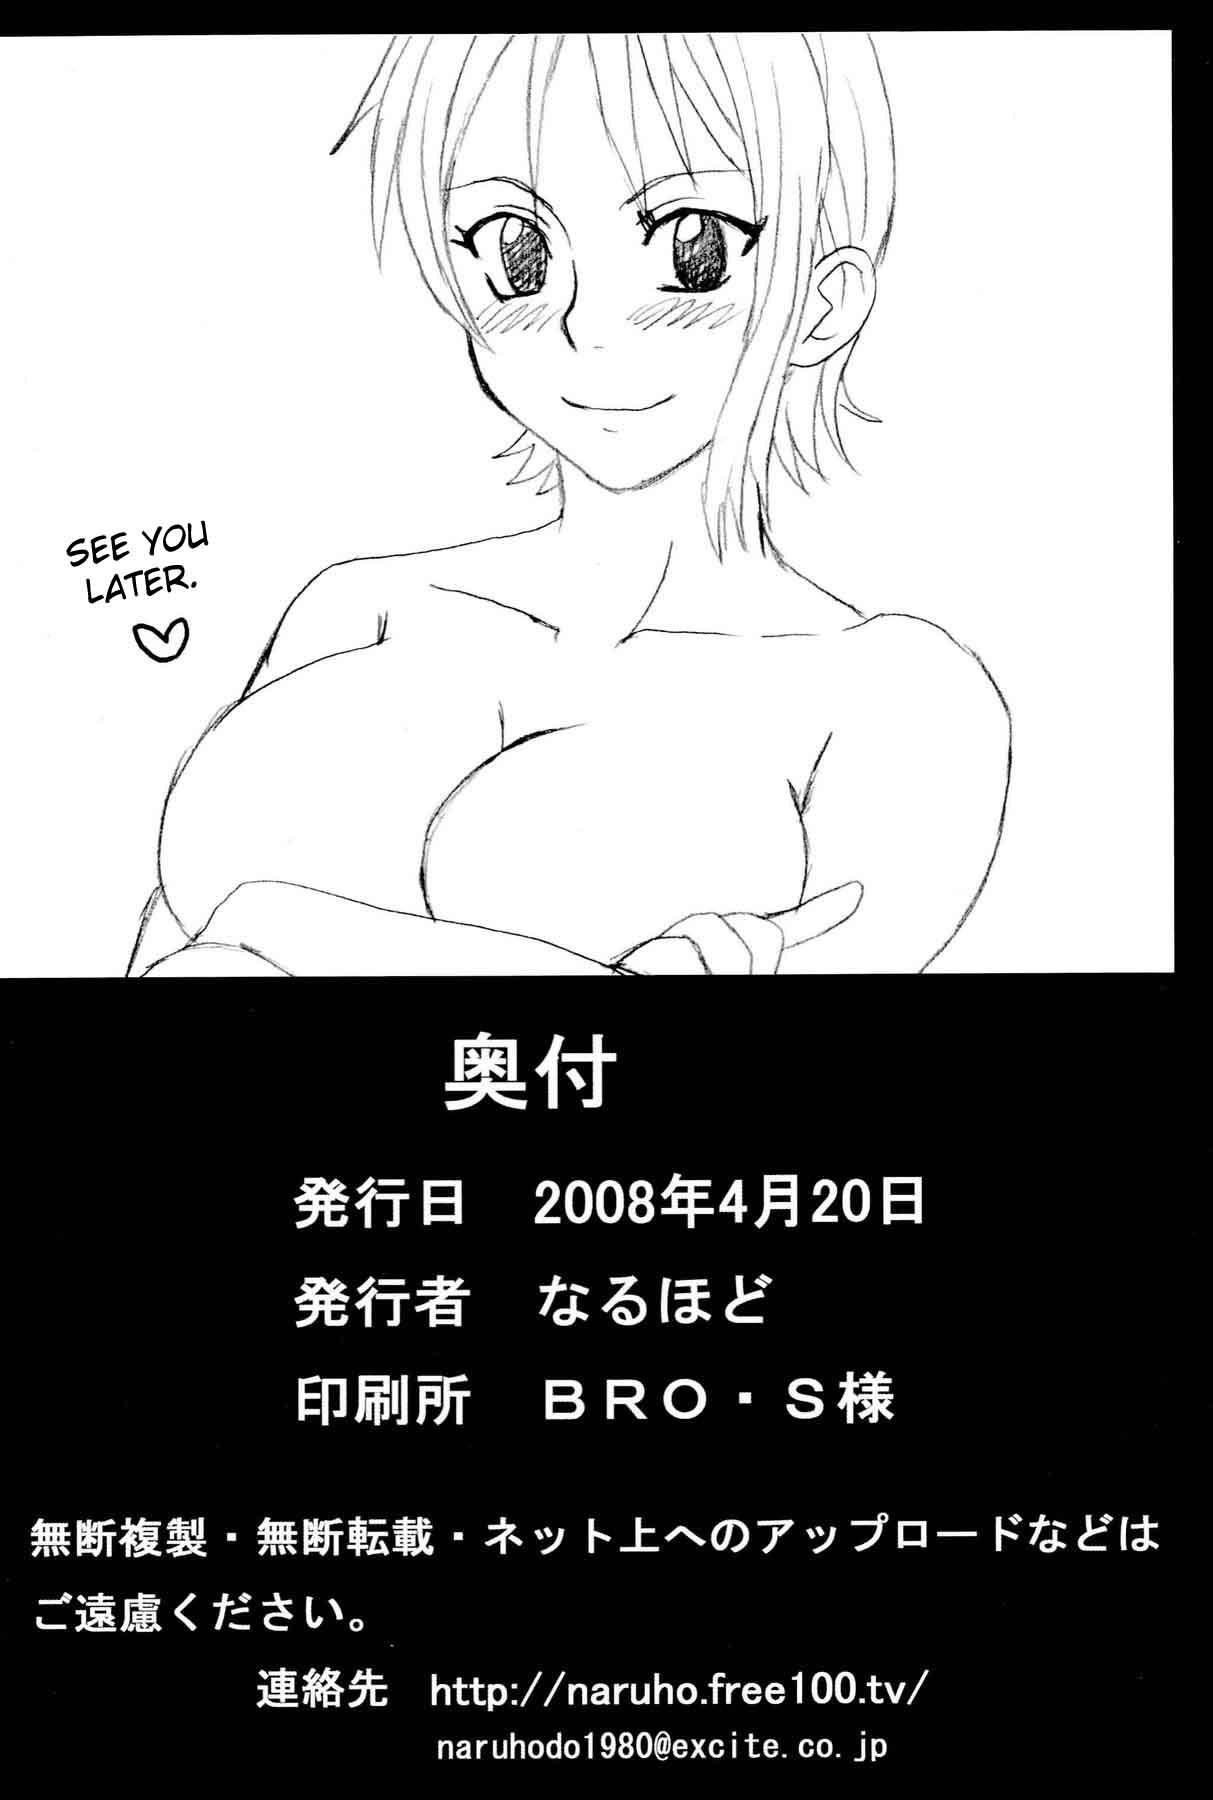 Ii Nami Yume Kibun | Good Nami Dream Feeling 40